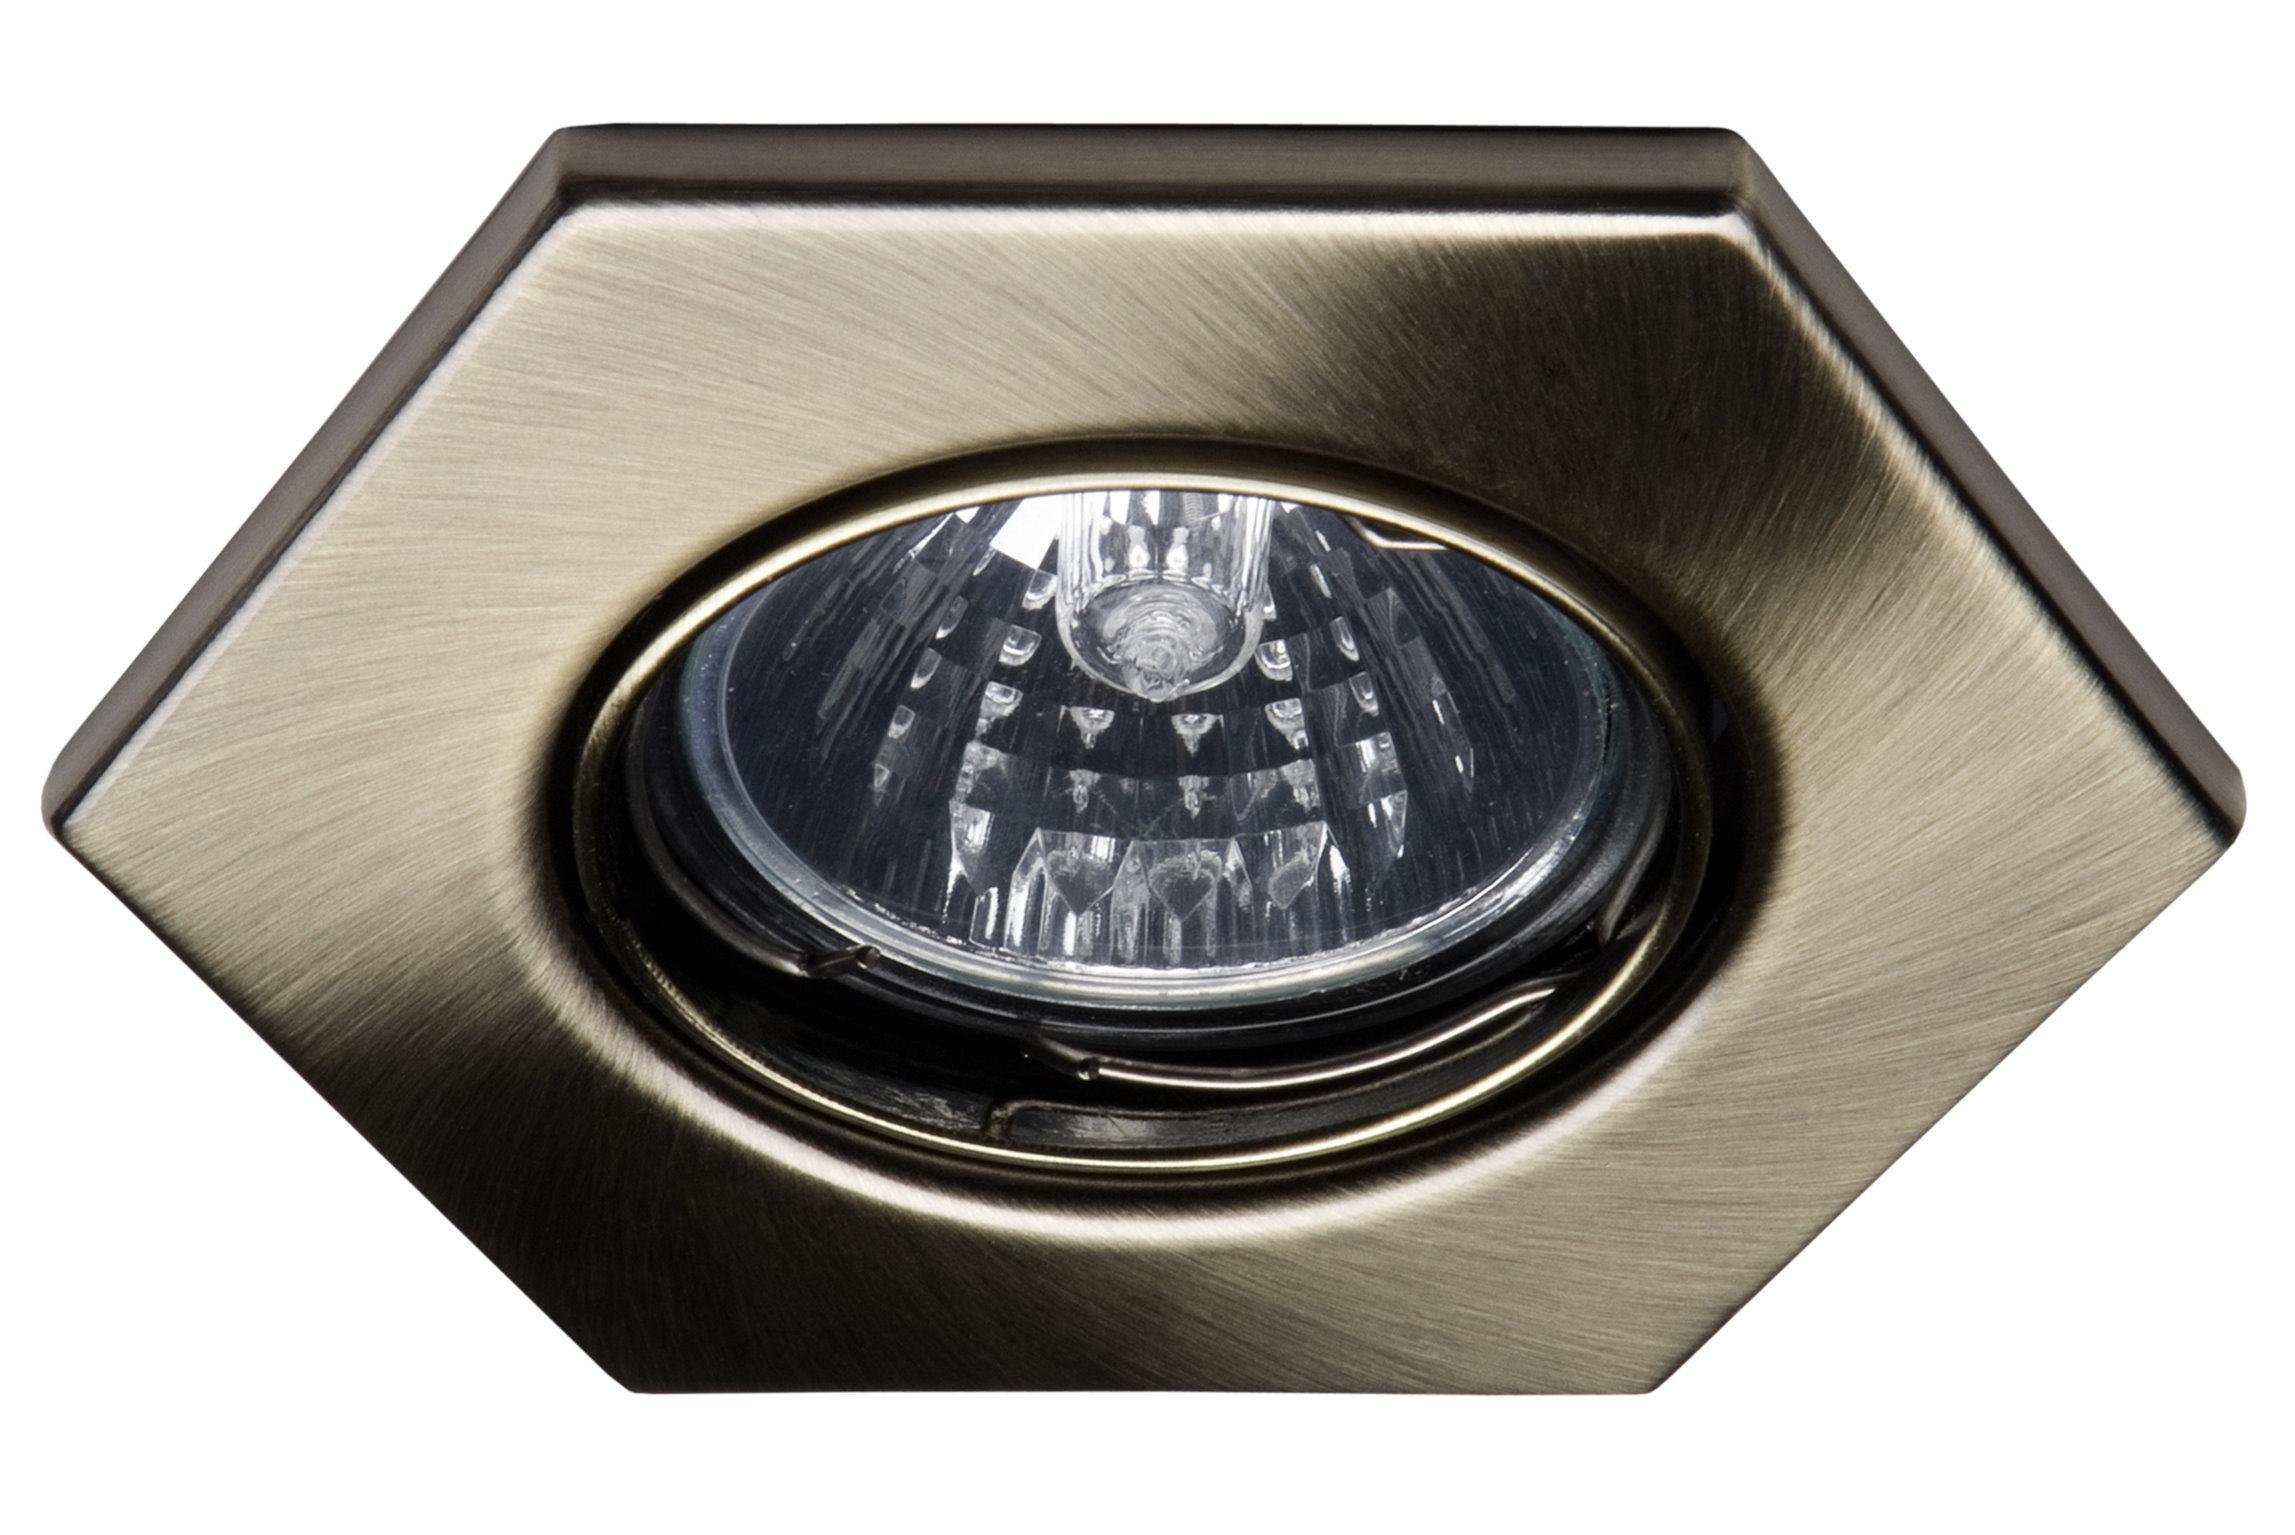 halogen einbaustrahler 5 x 20 w lampen 6 eck spots inkl trafo und leuchtmittel ebay. Black Bedroom Furniture Sets. Home Design Ideas